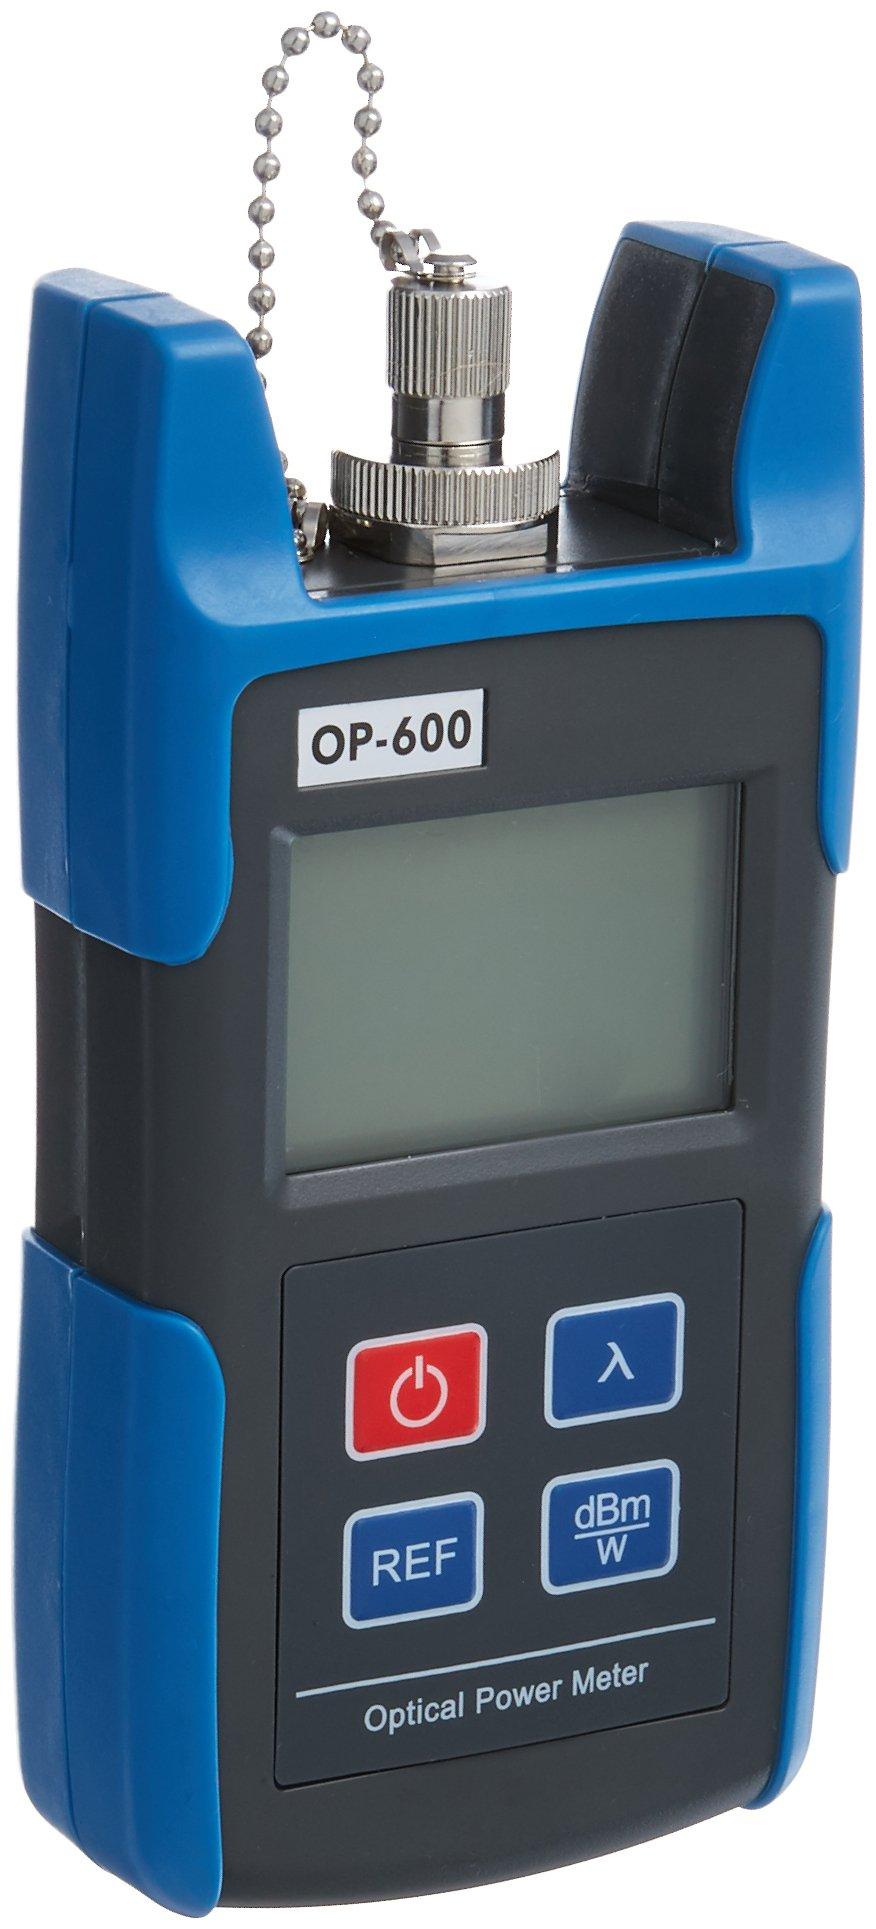 Optical Power Meter, SainSonic WattsOut OP-600, Portable Optical Power Meter, -50 - +26 dBm, SC/FC/ ST Interfaces, Fiber TL510C for CATV Test, CCTV Test and Telecommunication